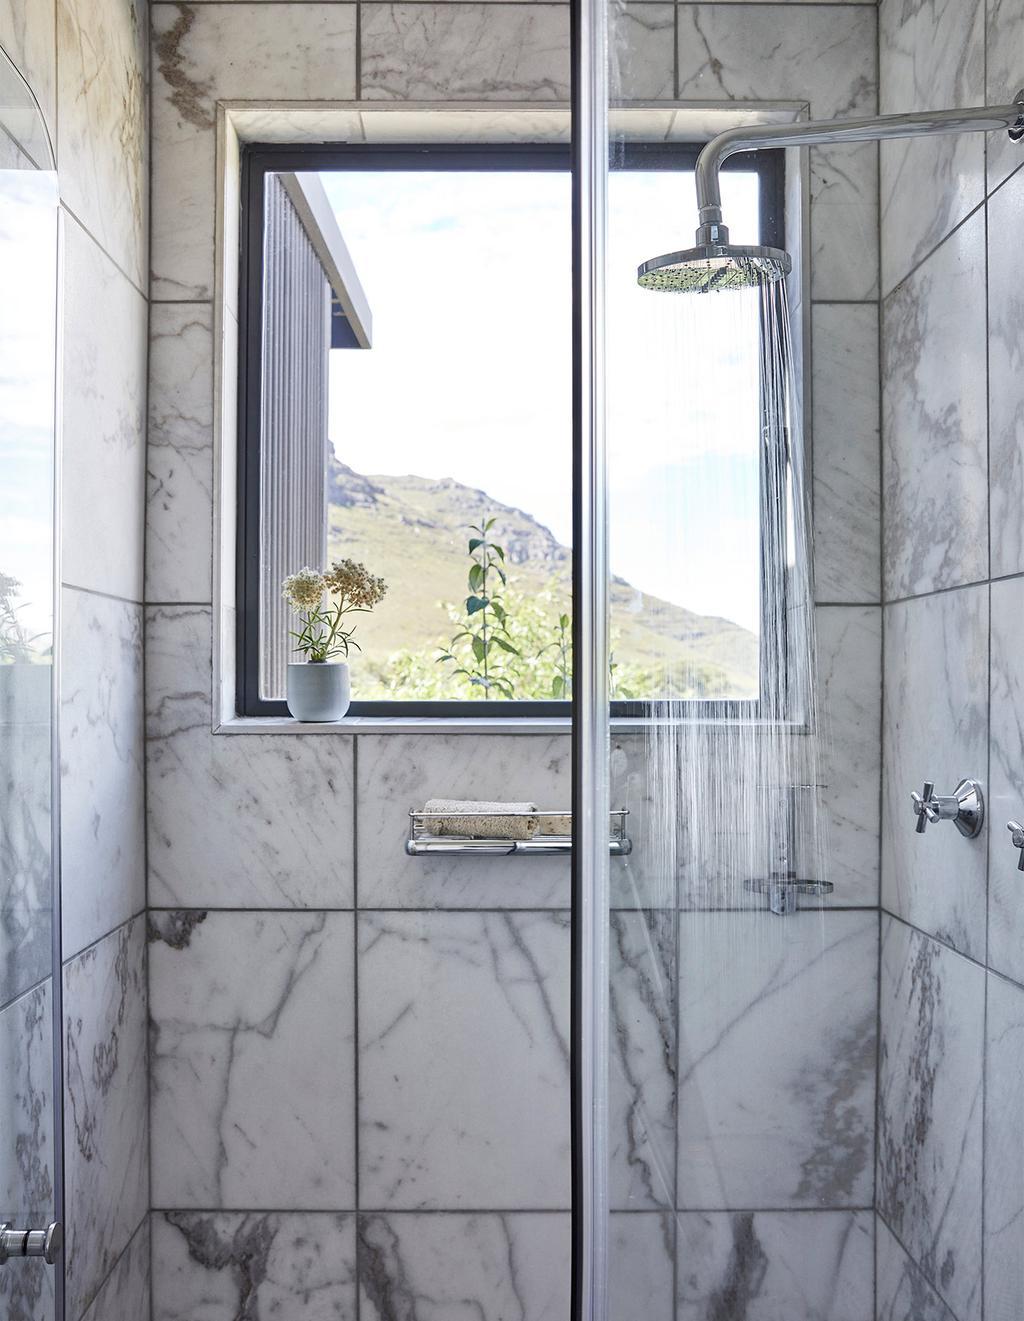 vtwonen special zomerhuizen 07-2021   marmer in de douche